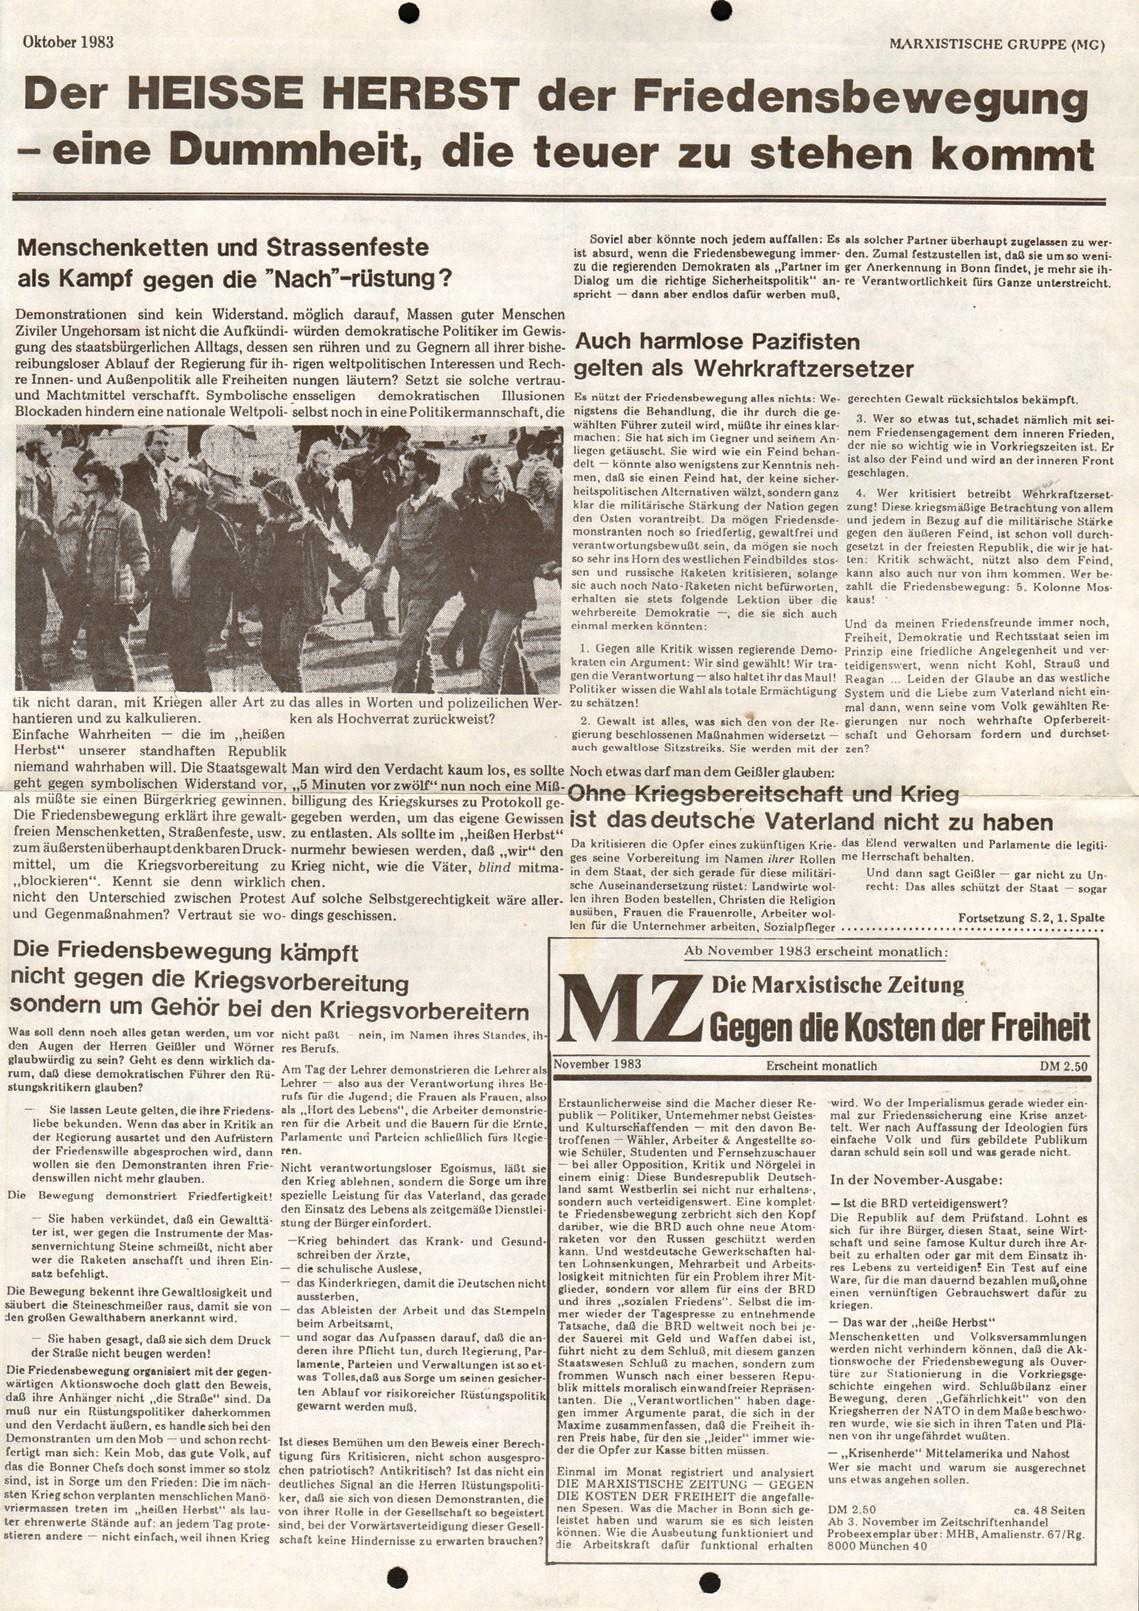 Berlin_MG_FB_19831024_01